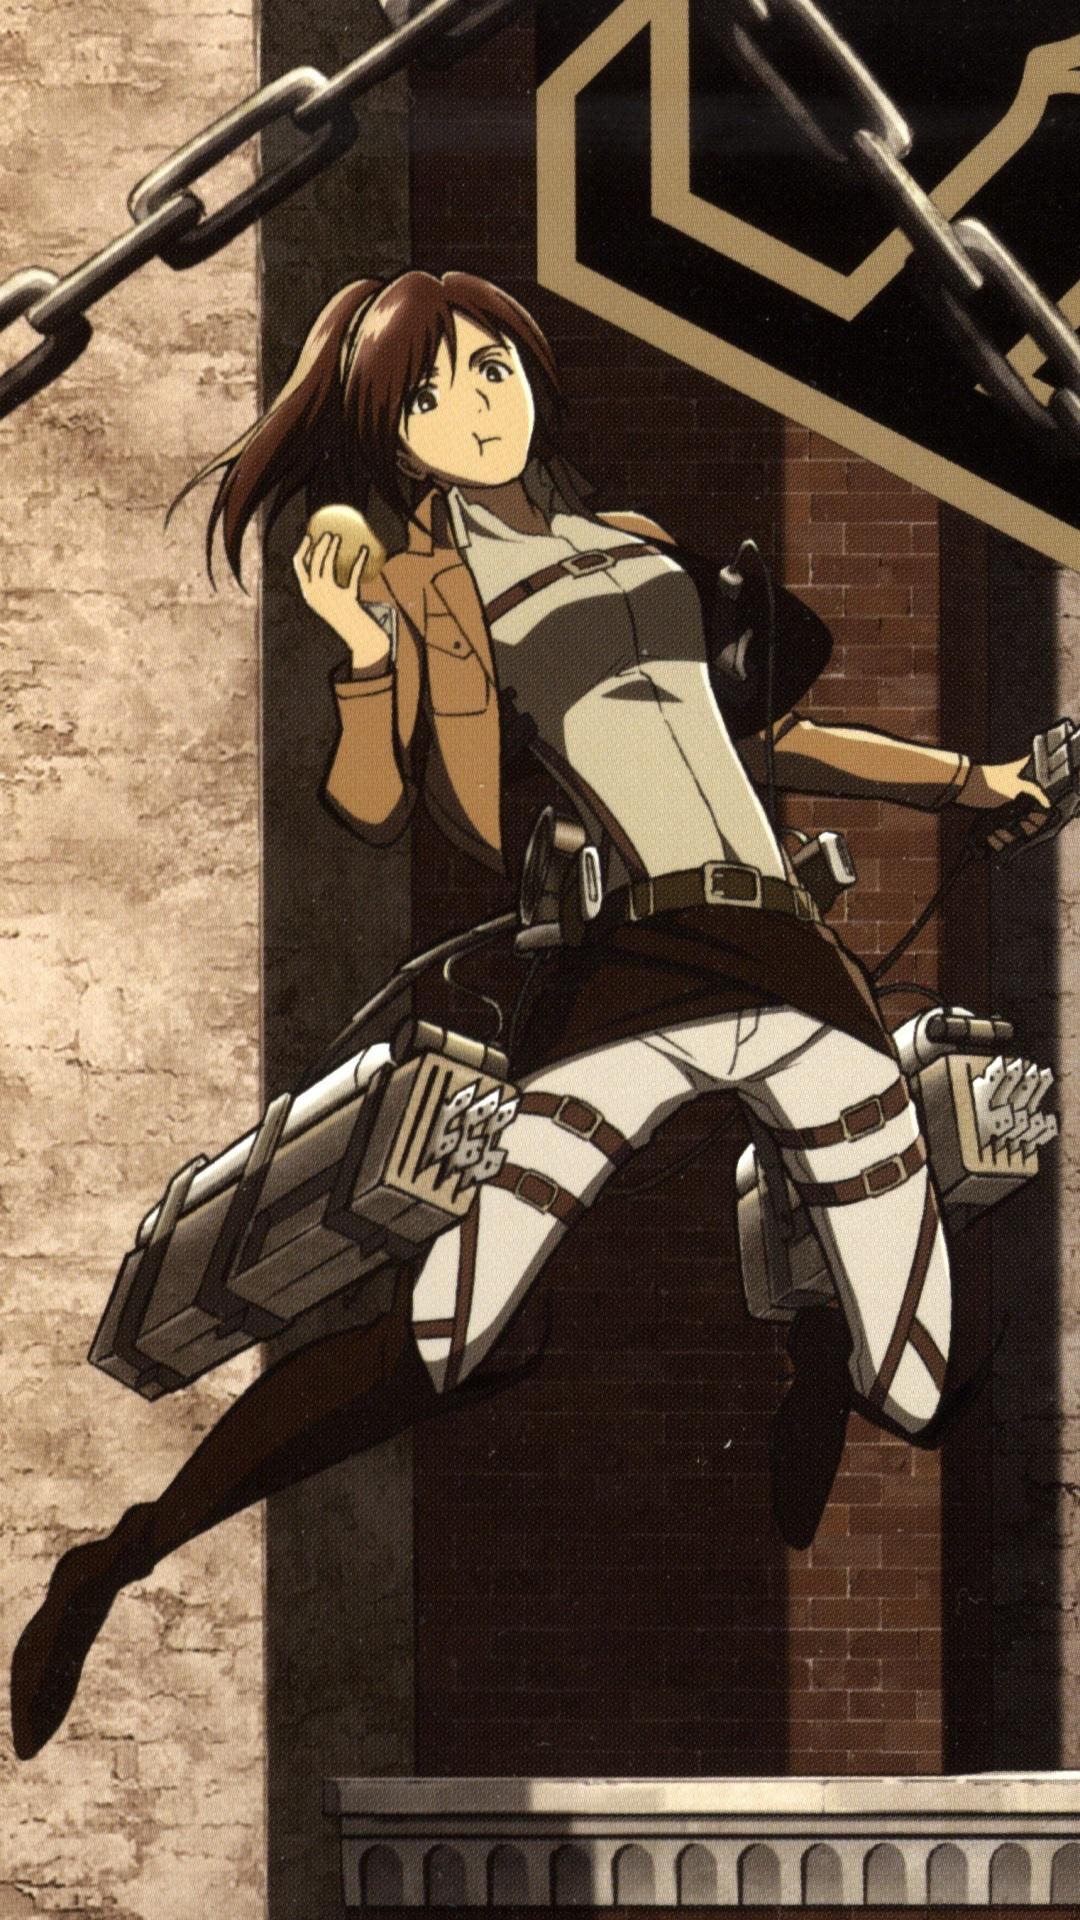 Shingeki No Kyojin Attack On Titan Sasha Iphone 1080x1920 Wallpaper Teahub Io